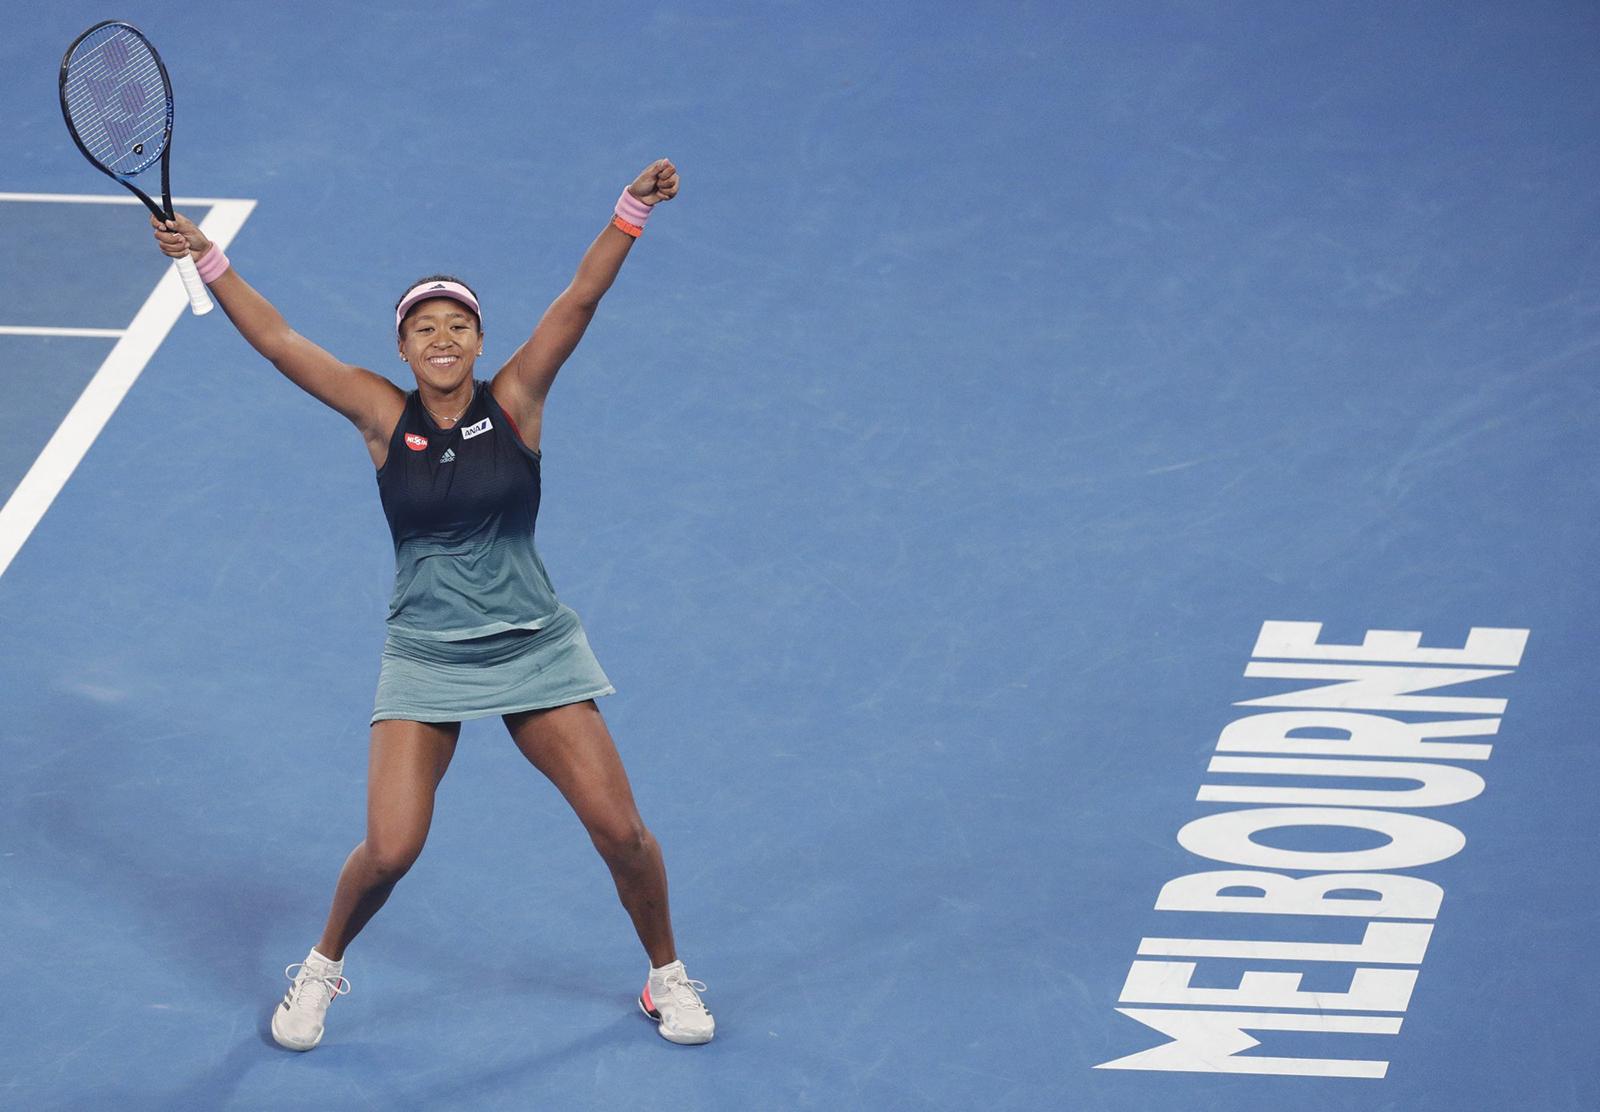 Japan's Naomi Osaka celebrates after defeating Karolina Pliskova of the Czech Republic in their semifinal at the Australian Open tennis championships in Melbourne, Australia, Thursday, Jan. 24, 2019. (AP Photo/Aaron Favila)